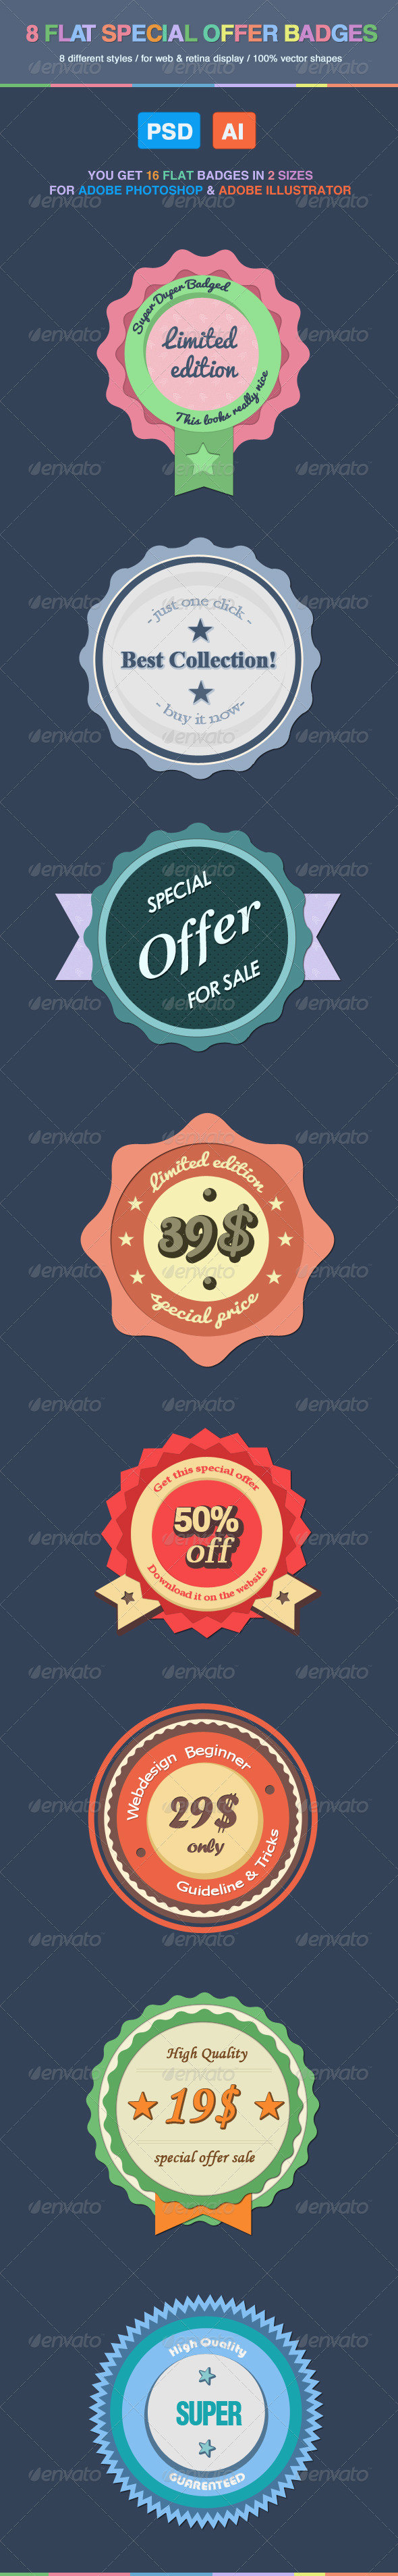 8 Flat Special Offer Badges